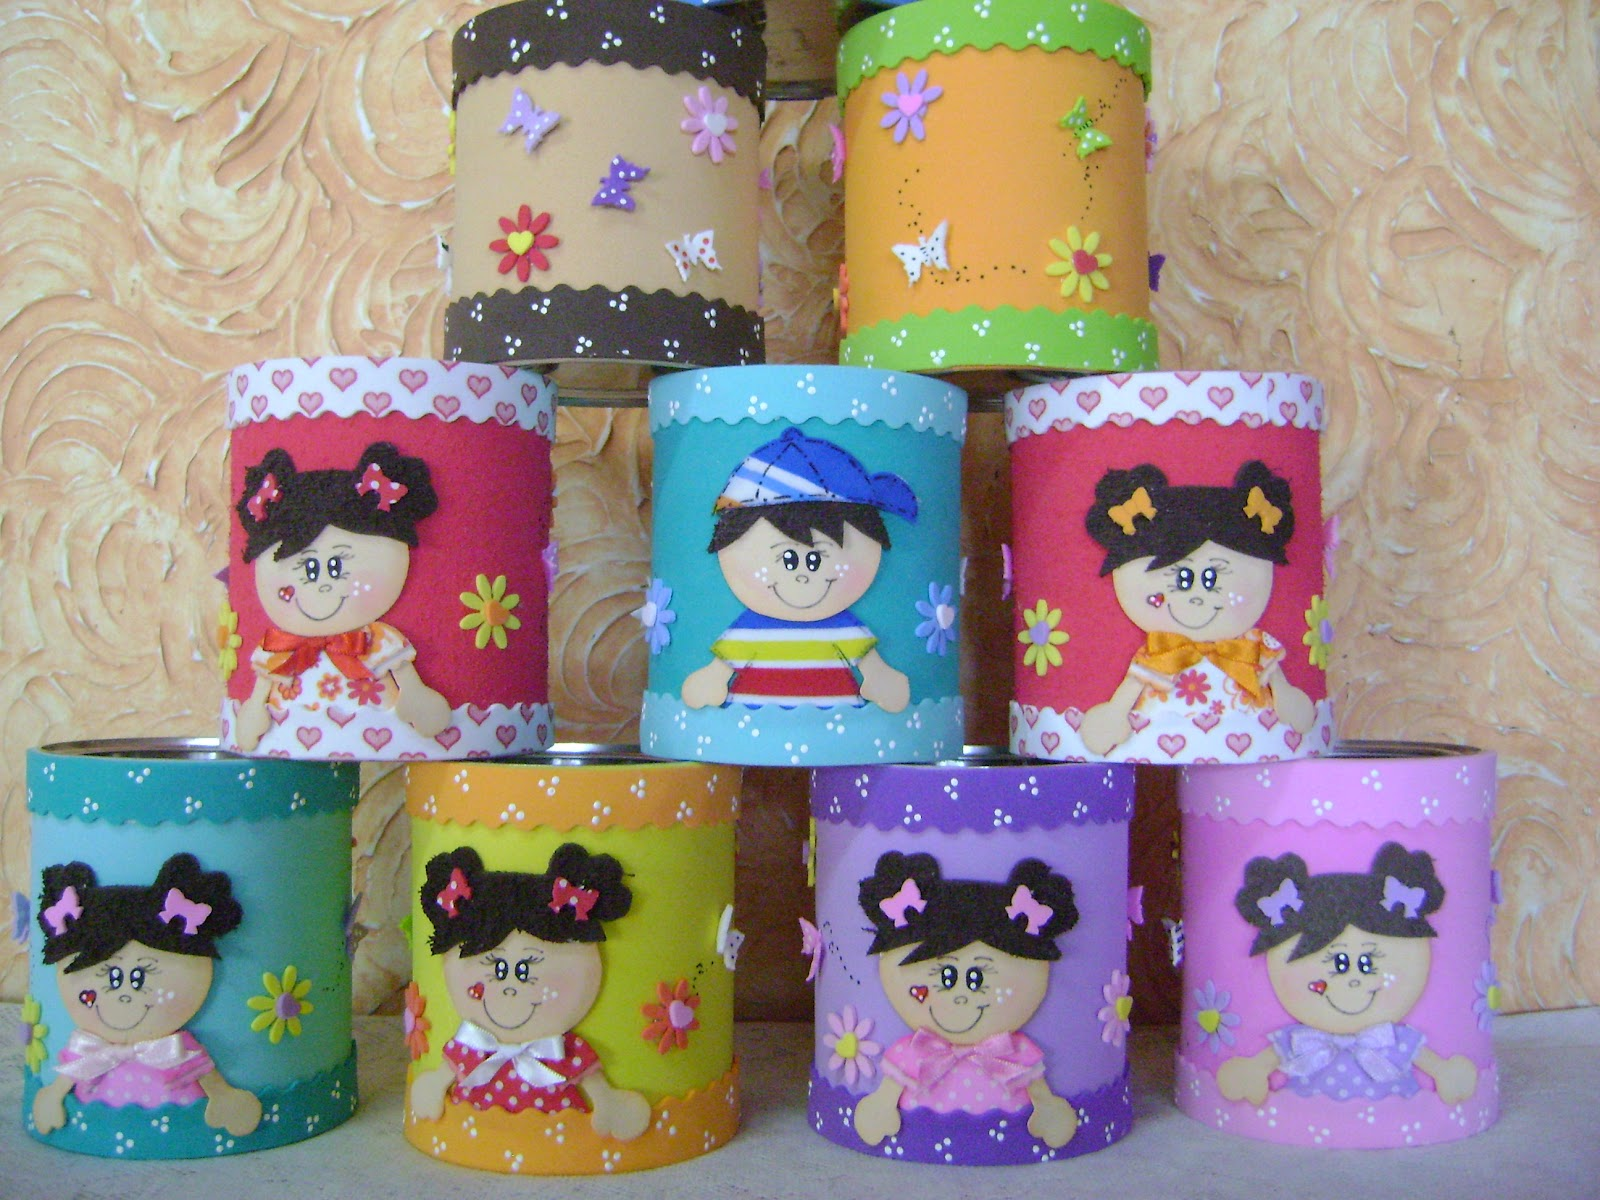 latas decoradas con foami o goma eva dale detalles